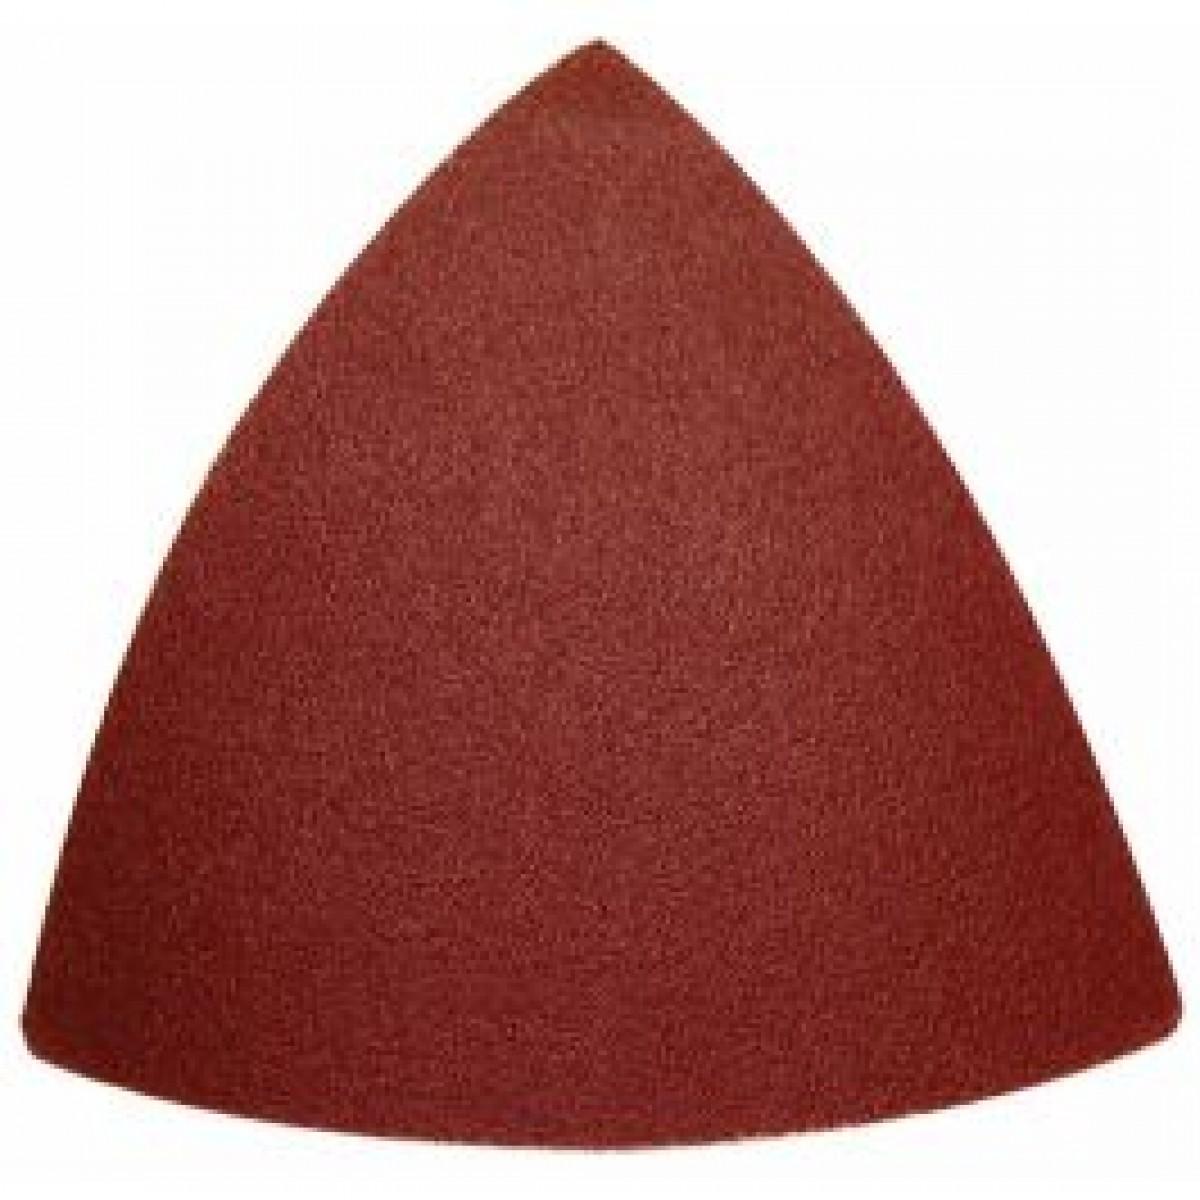 180 Grit Triangular Sanding Sheets 5 Pack